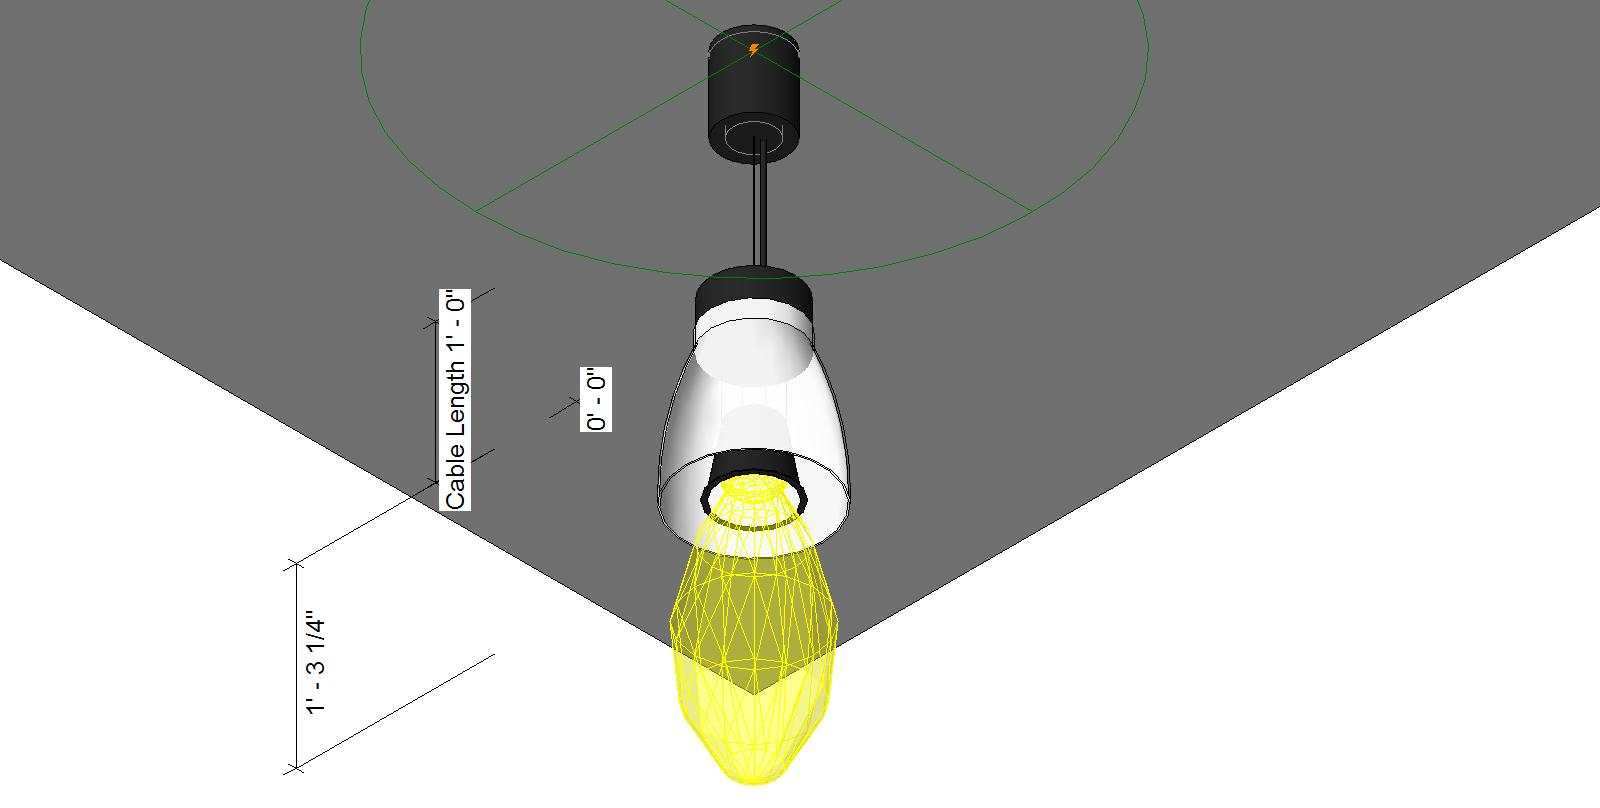 Pendant Lighting Revit Pendant Light Revit Model Pendant